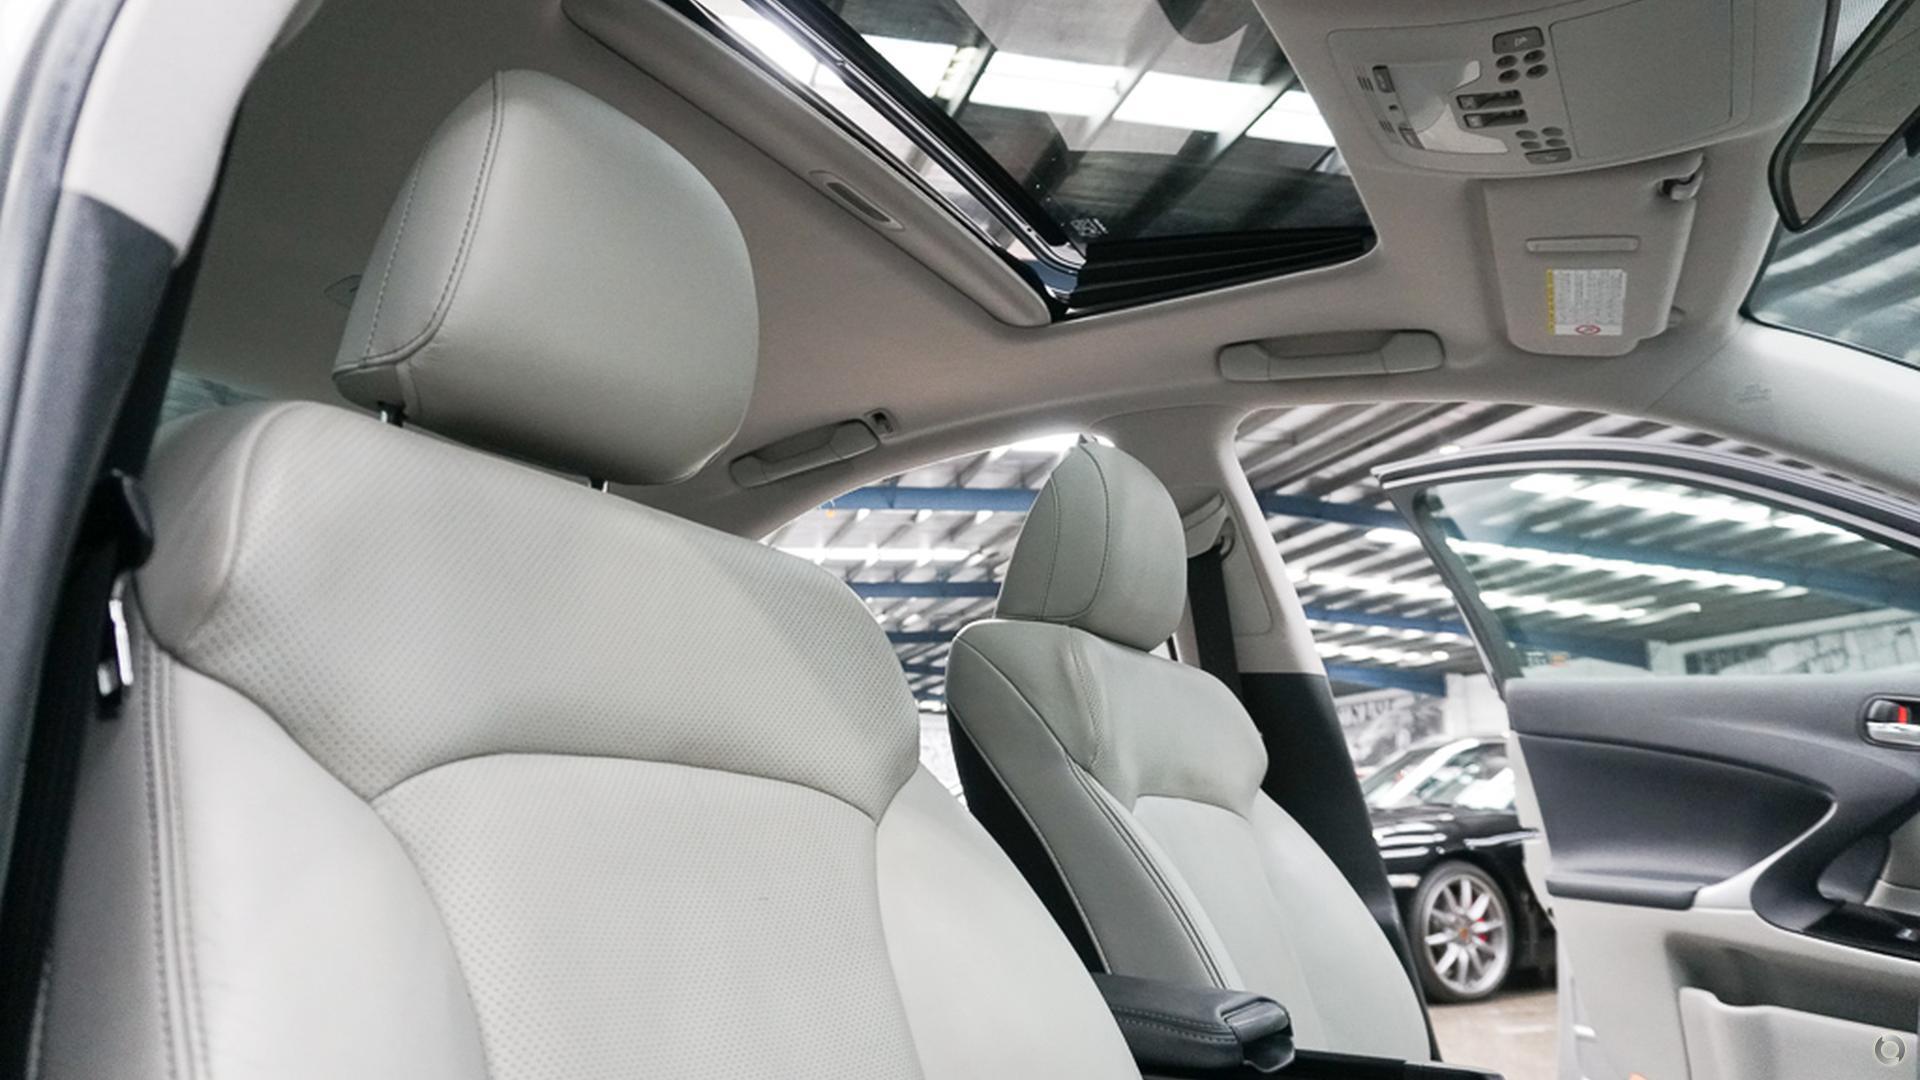 2010 Lexus IS350 Prestige GSE21R